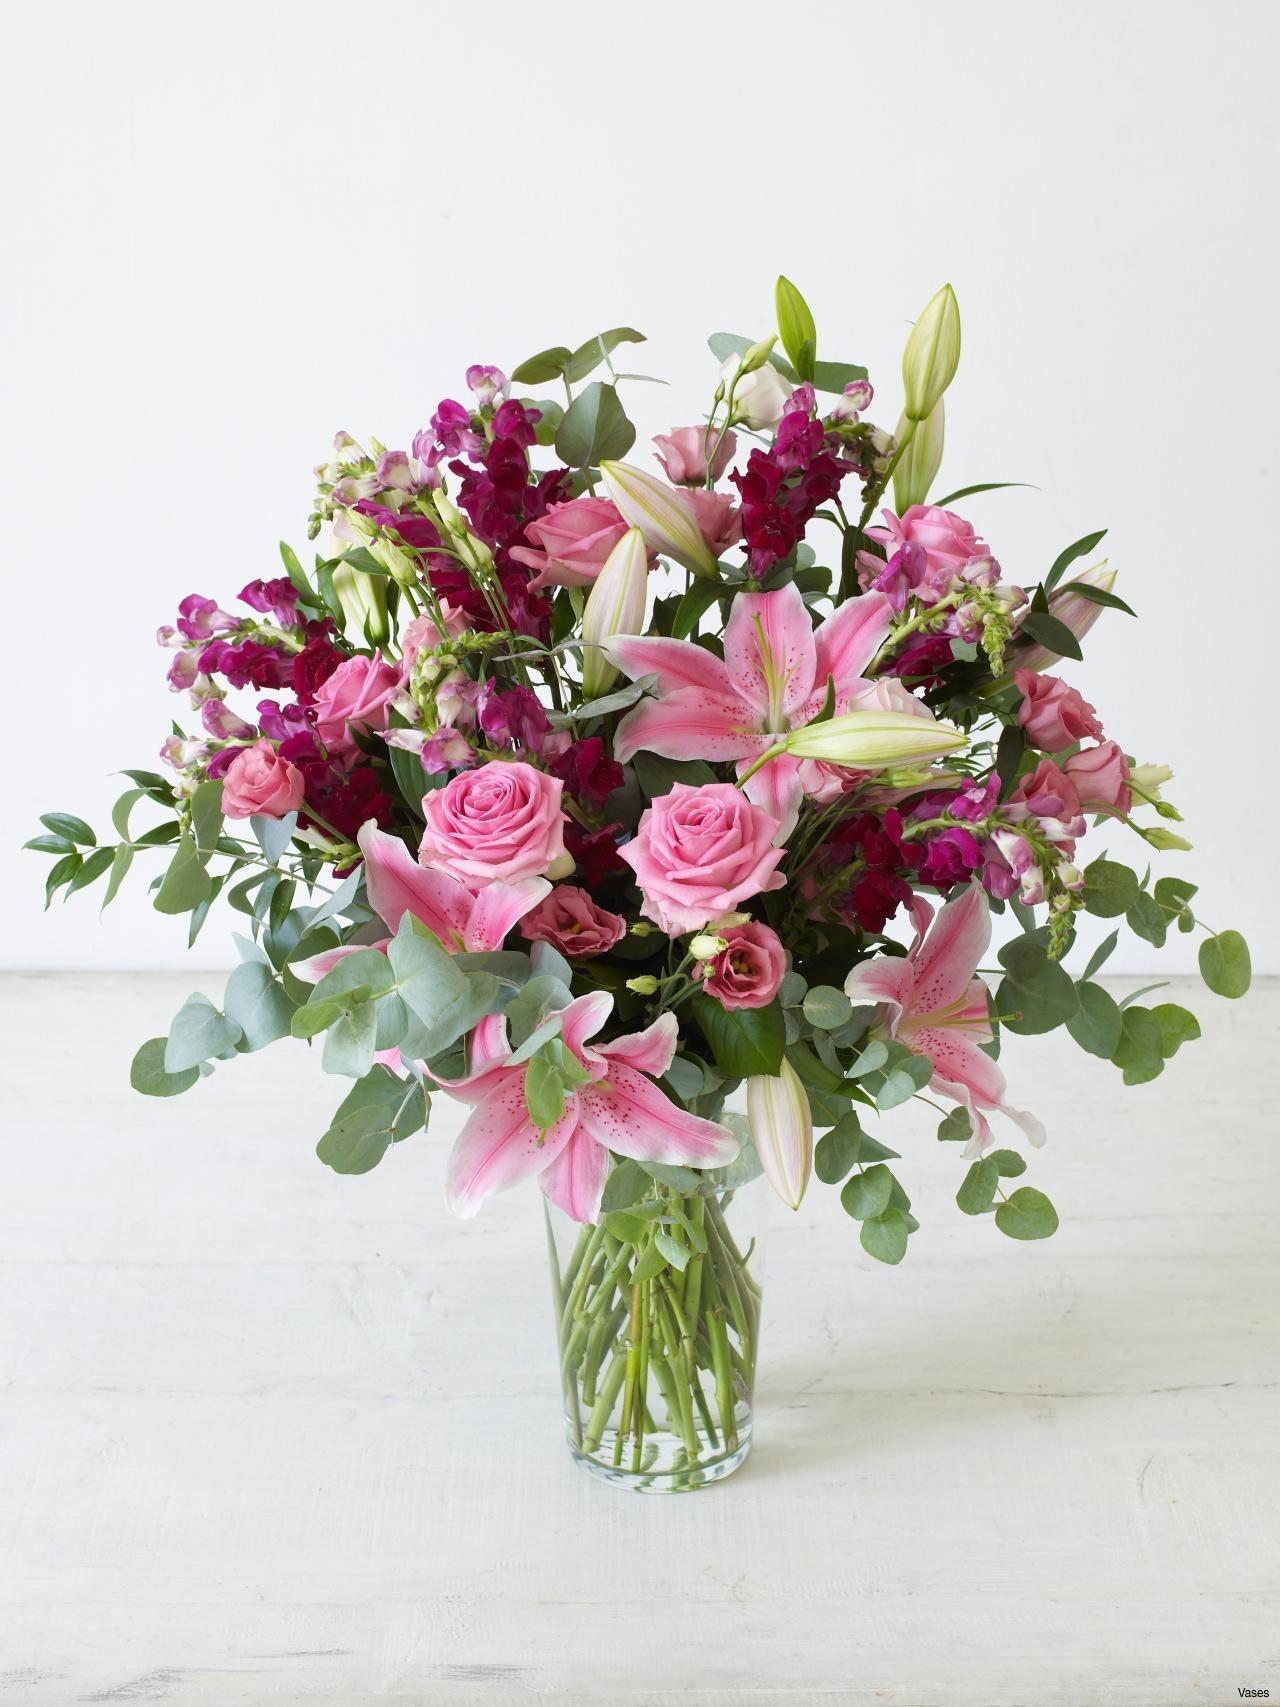 glass candy vases of 26 luxury wedding centerpieces ideas sokitchenlv regarding wedding centerpieces ideas new flower arrangements elegant floral arrangements 0d design ideas of 26 luxury wedding